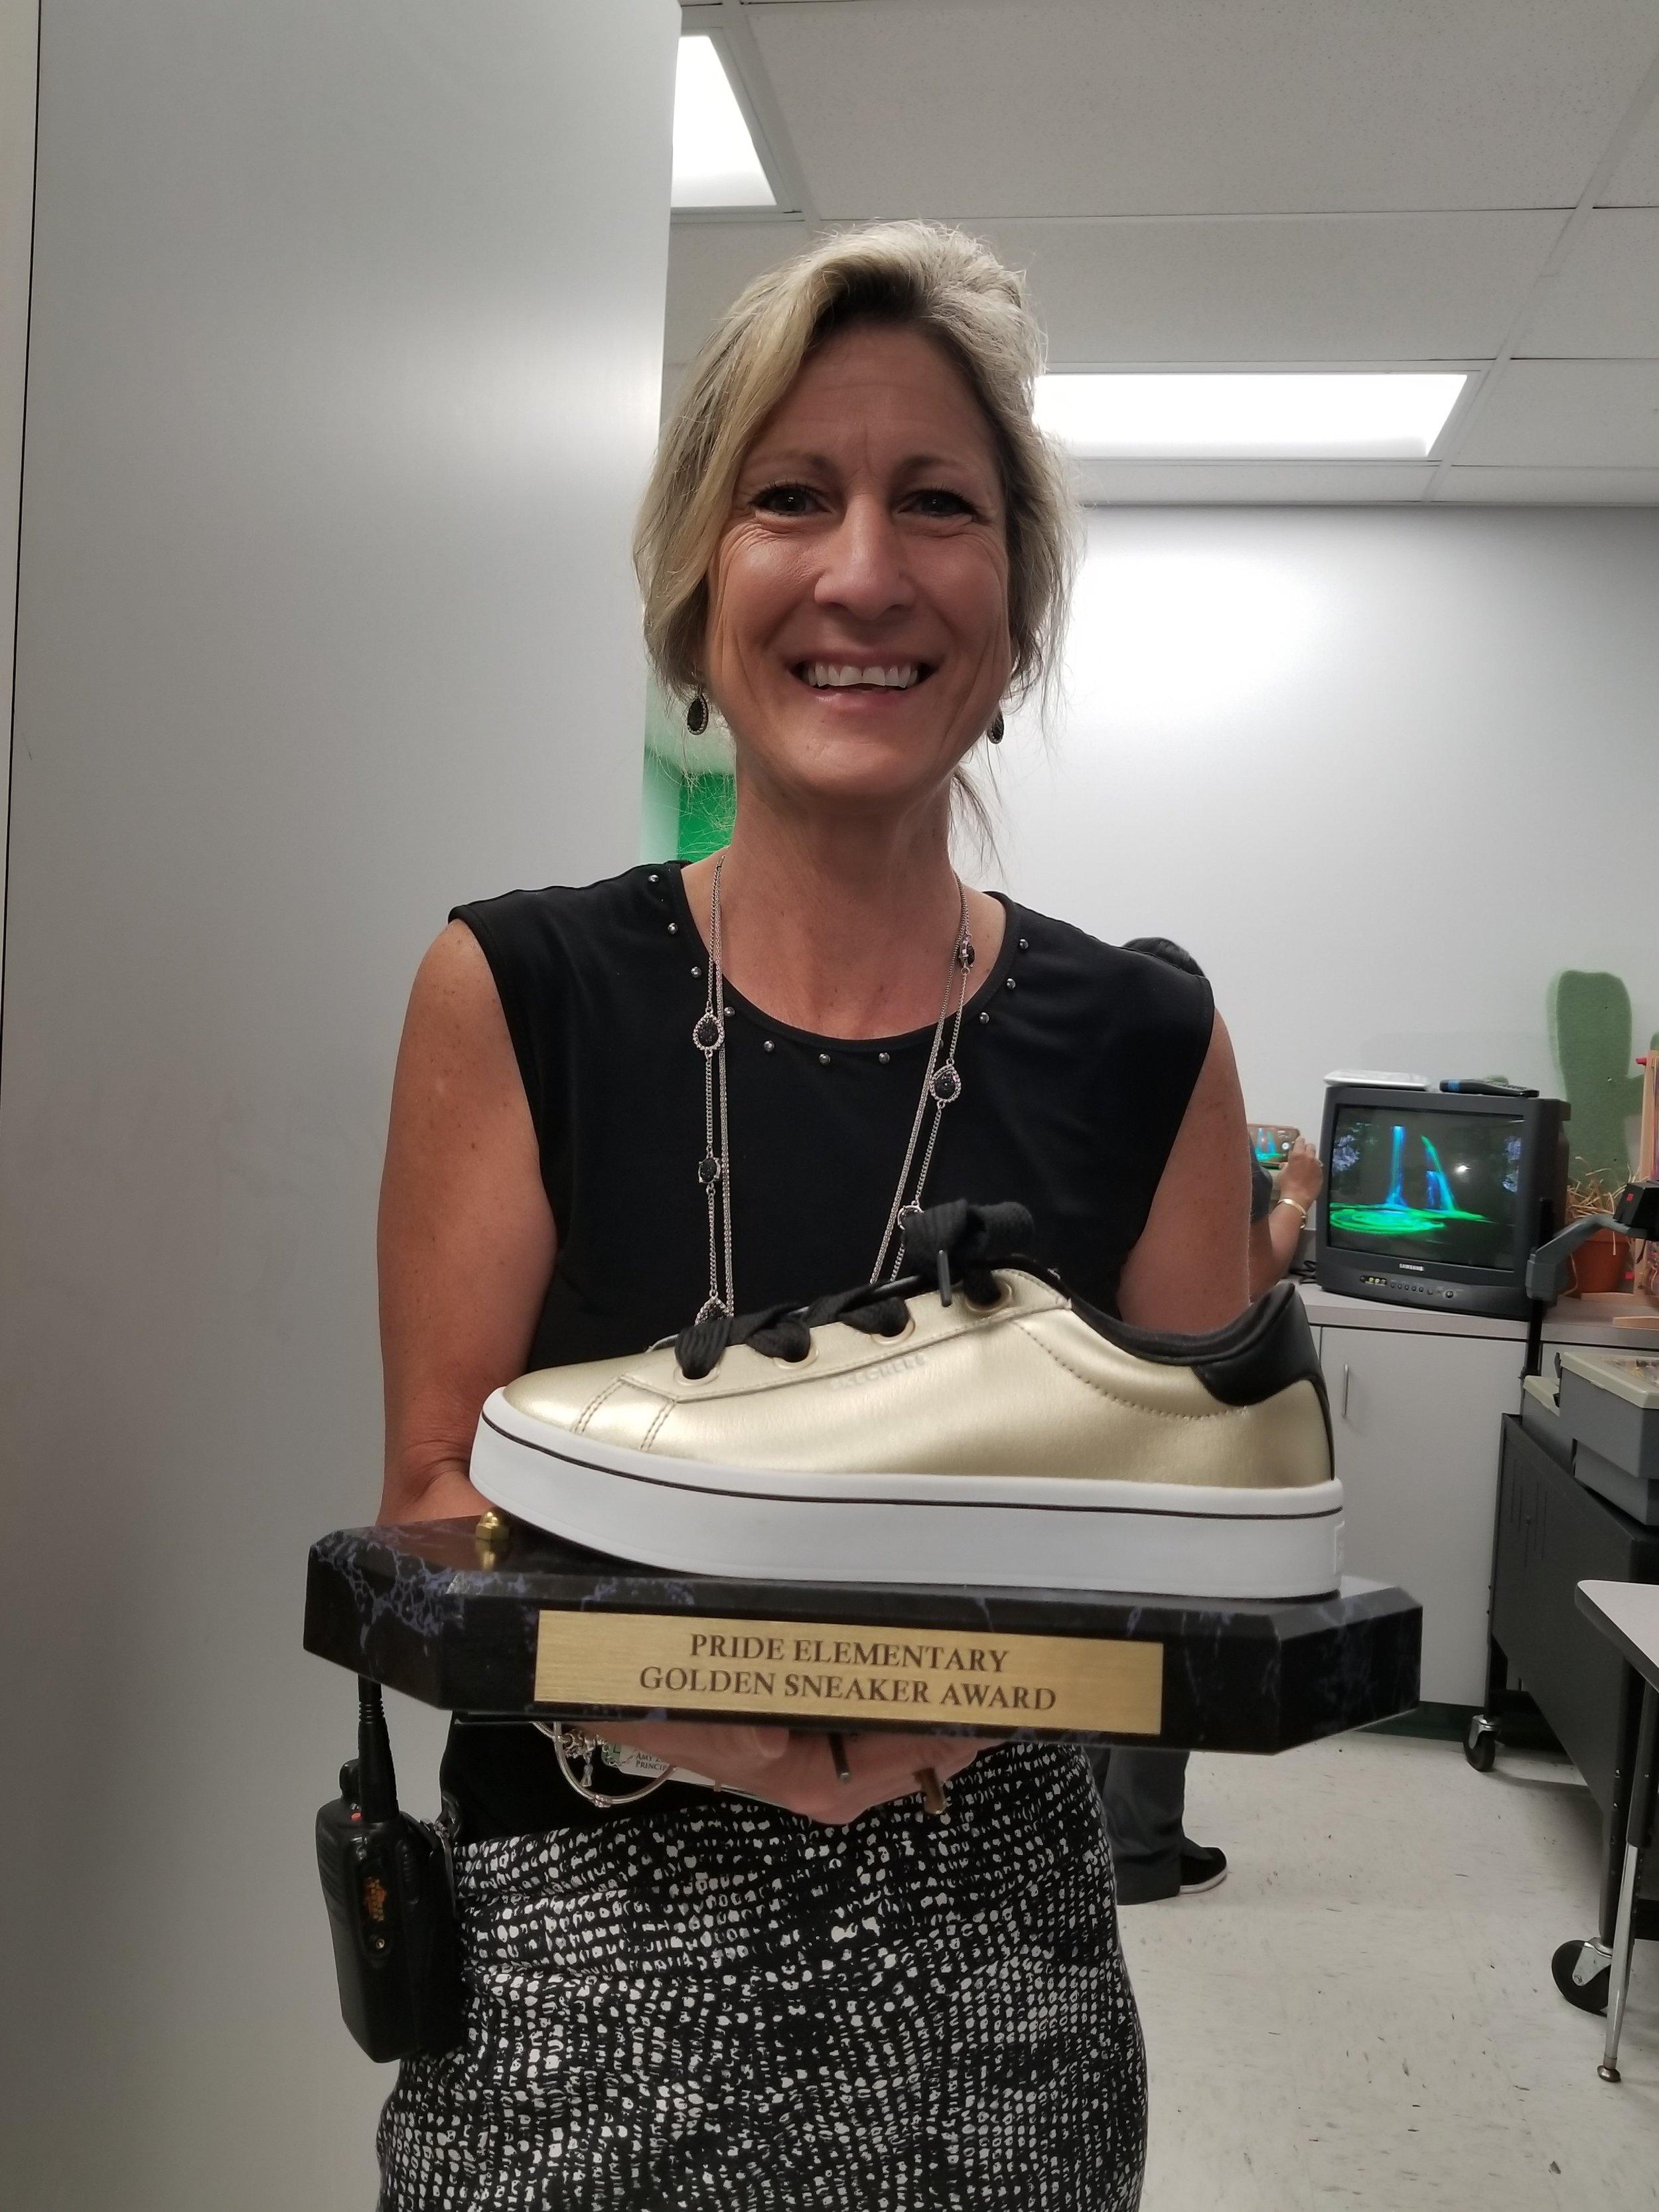 Principal Zilbar presenting the Golden Sneaker Award.